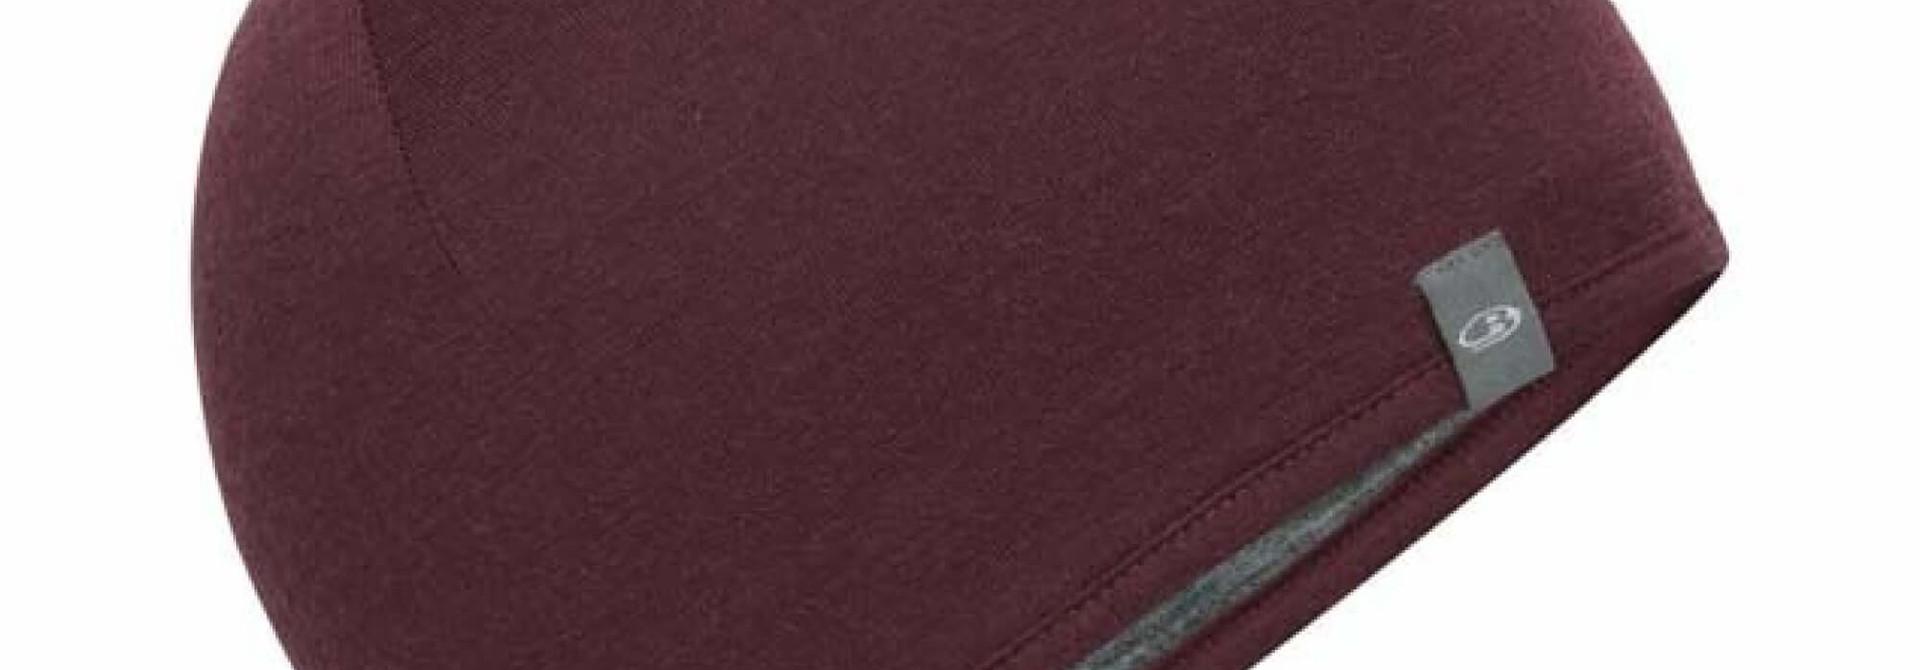 Unisex Merino Pocket Beanie